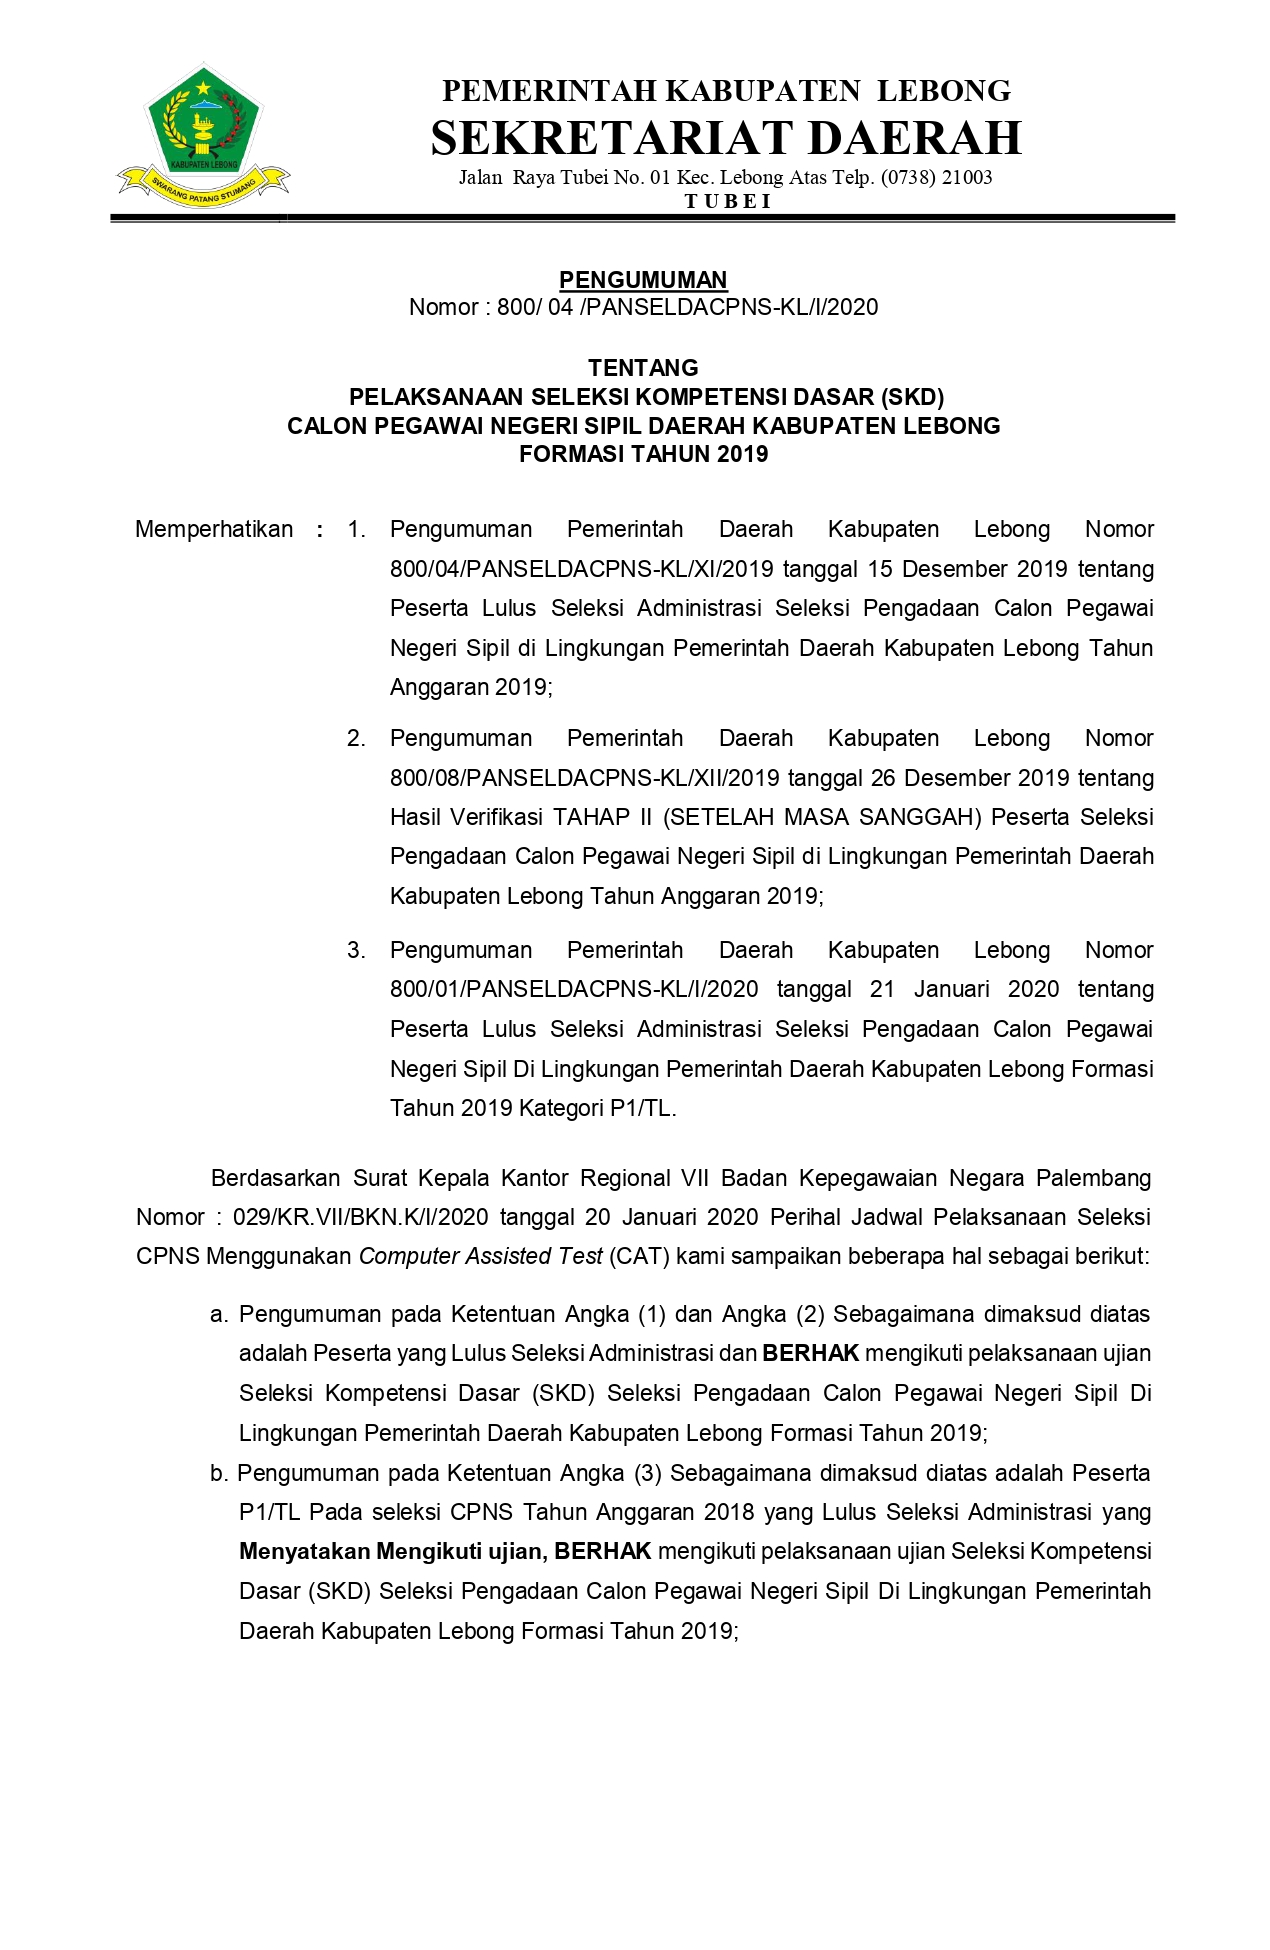 PELAKSANAAN SKD CPNSD KAB. LEBONG FORMASI TAHUN 2019